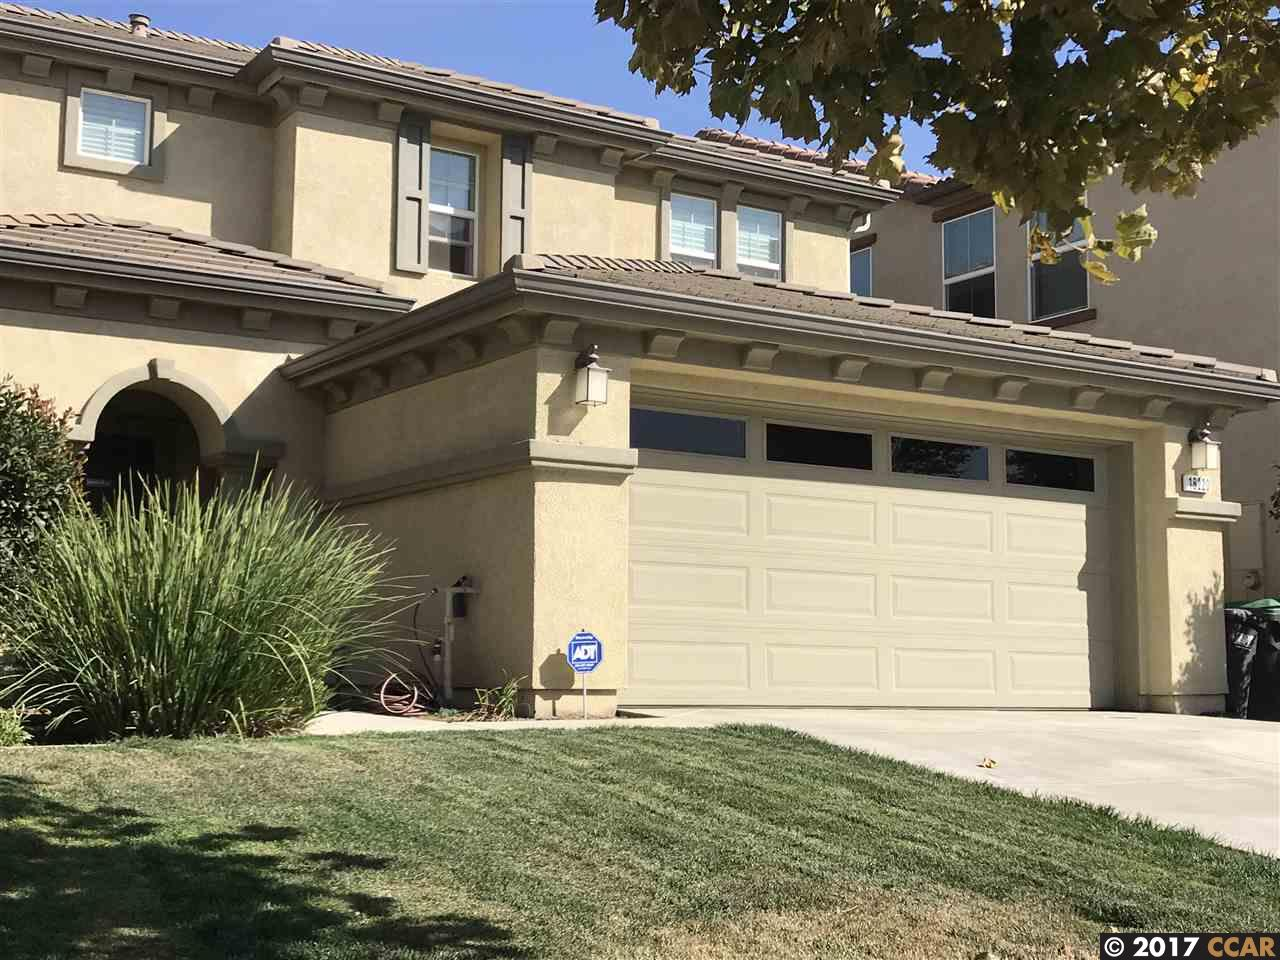 Single Family Home for Sale at 18220 Schumard Oak Road 18220 Schumard Oak Road Lathrop, California 95330 United States